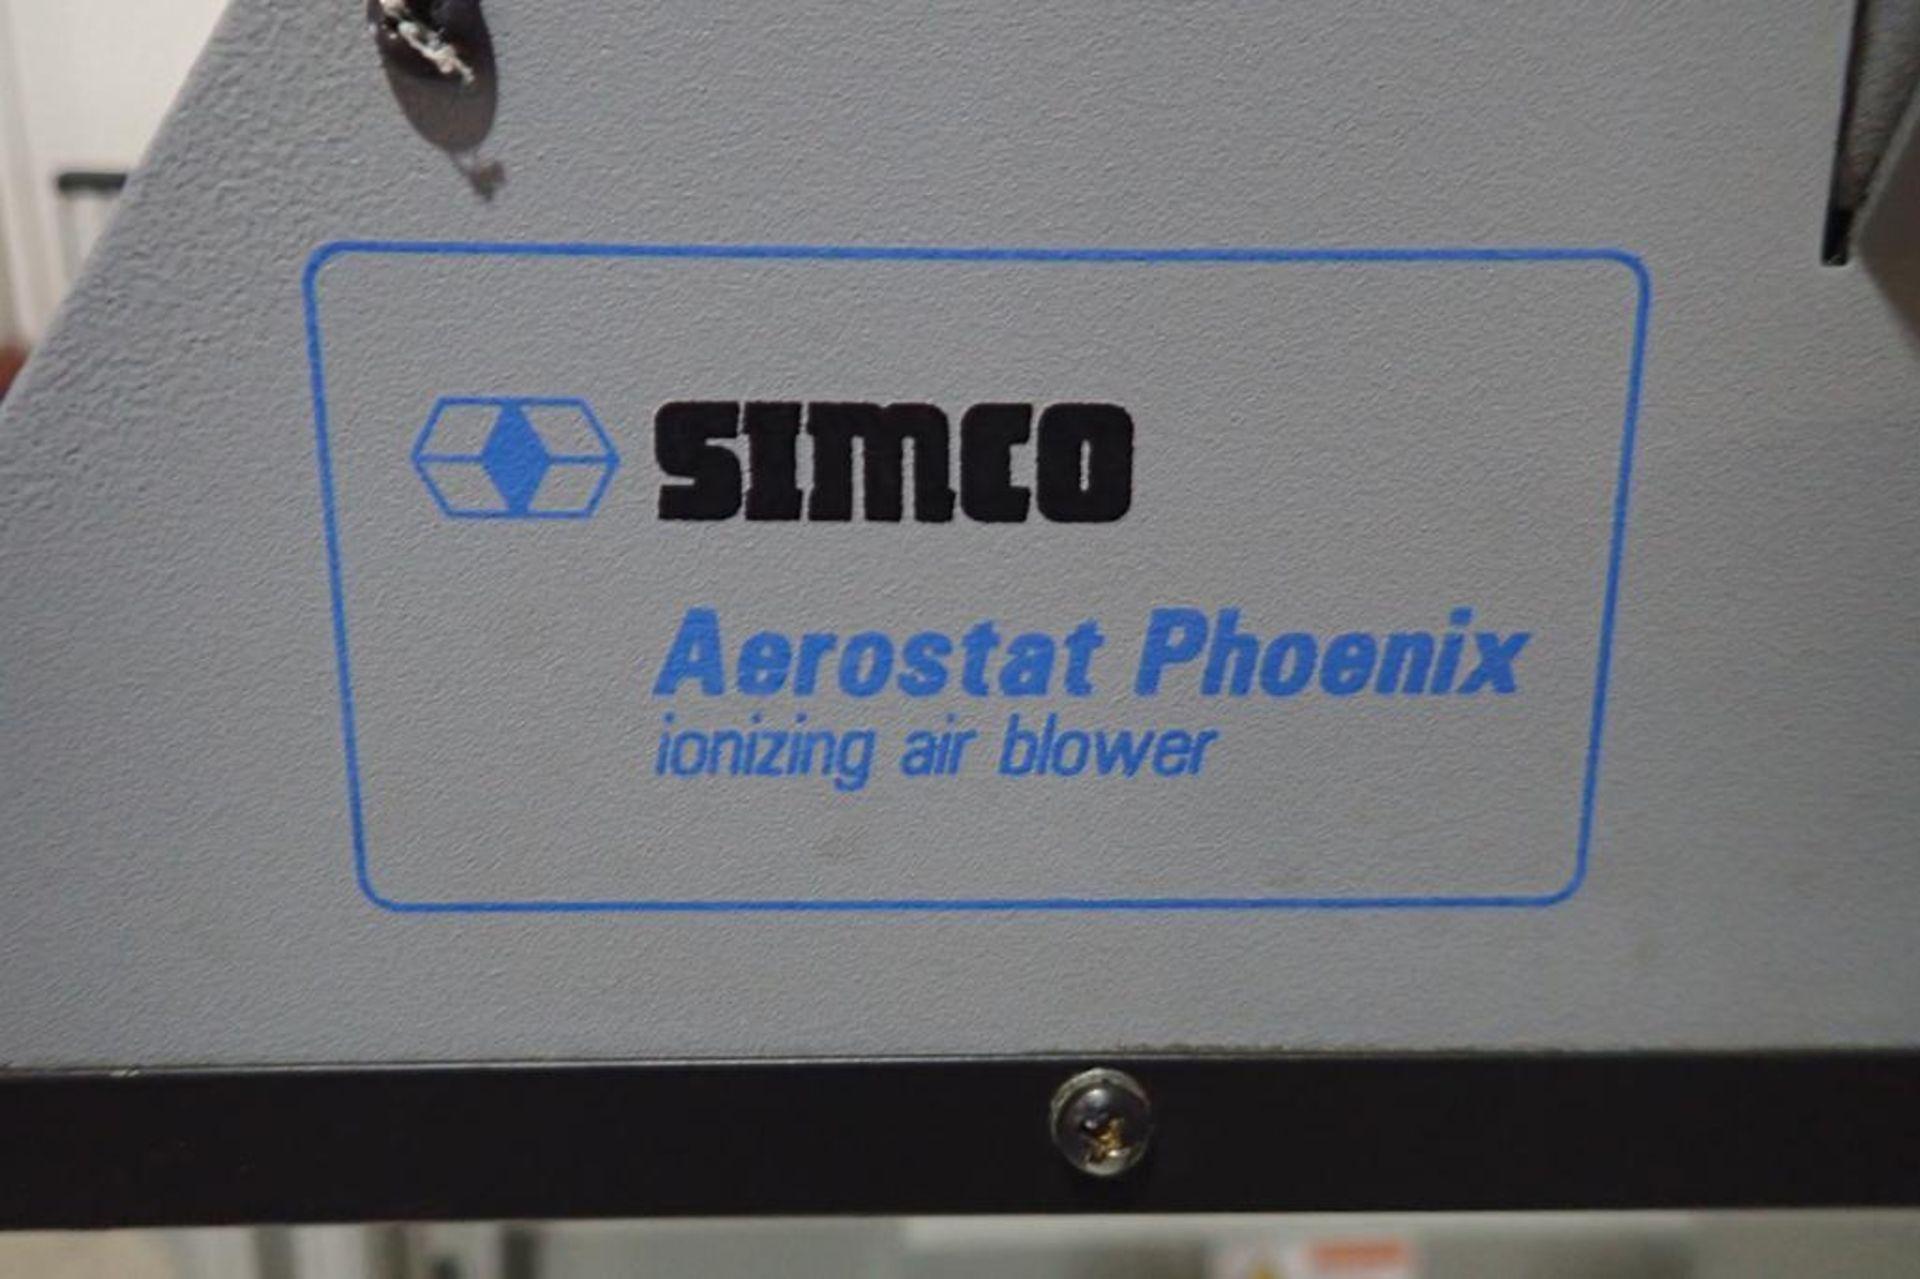 Lot 31 - Stork Texwrap transfer conveyor, Model STE-SA359, SN SA0217, with Simco ionizing air blower, white